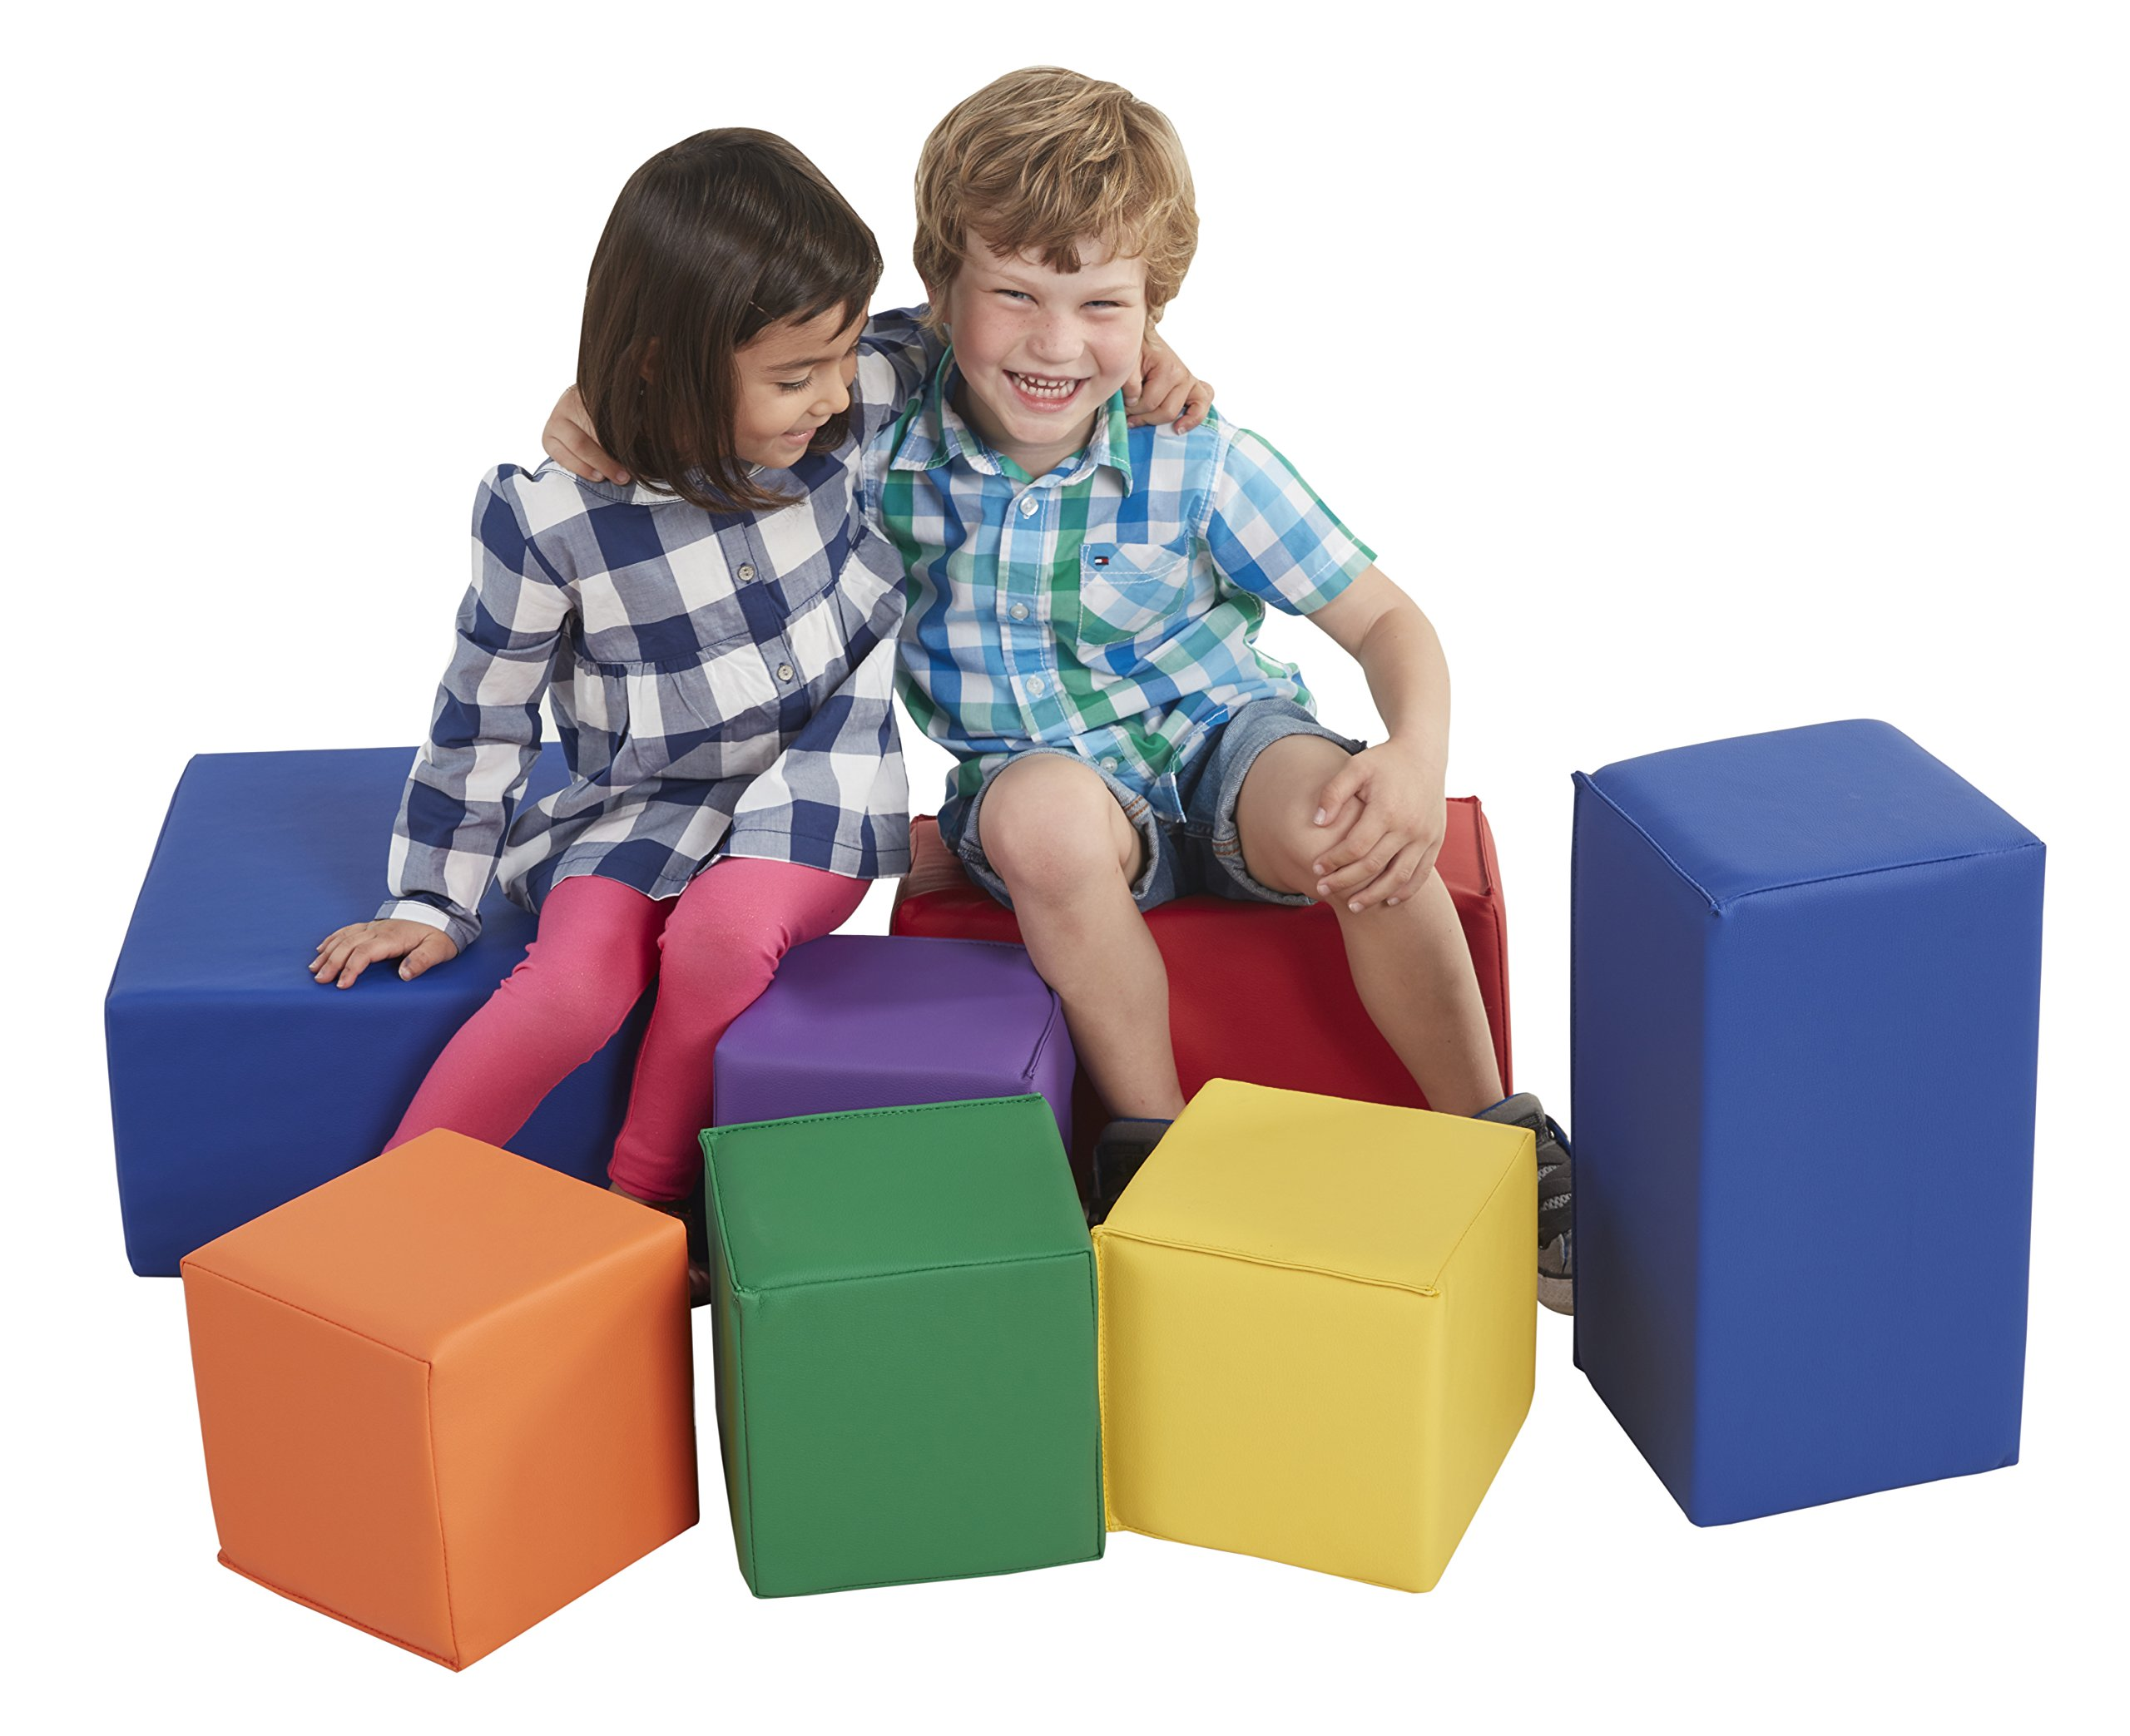 ECR4Kids Softzone Foam Big Building Blocks, Soft Play for Kids (7-Piece Set), Big Blocks, Primary